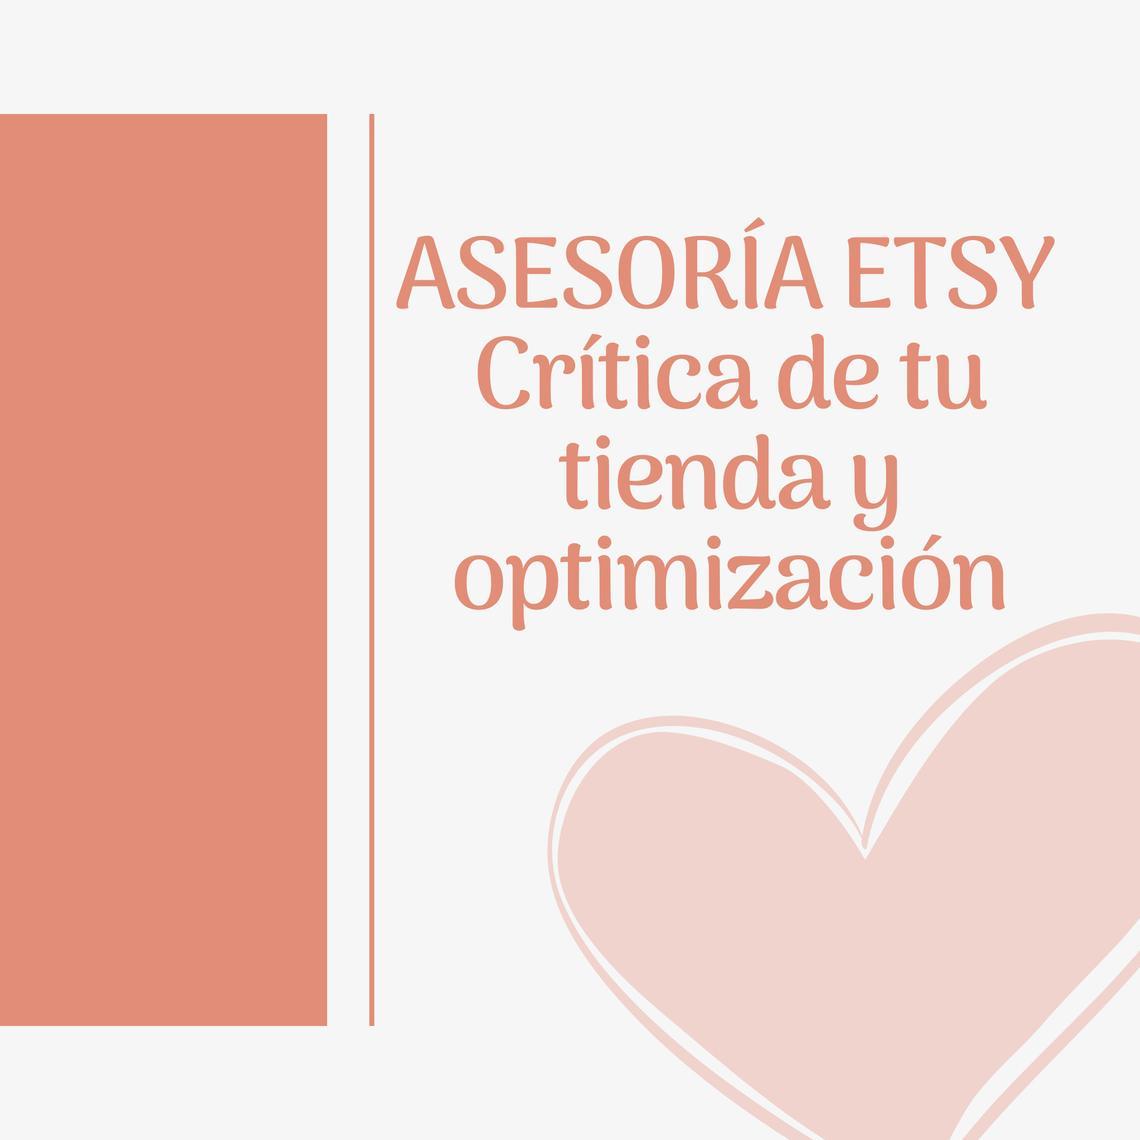 asesoria etsy optimizacion